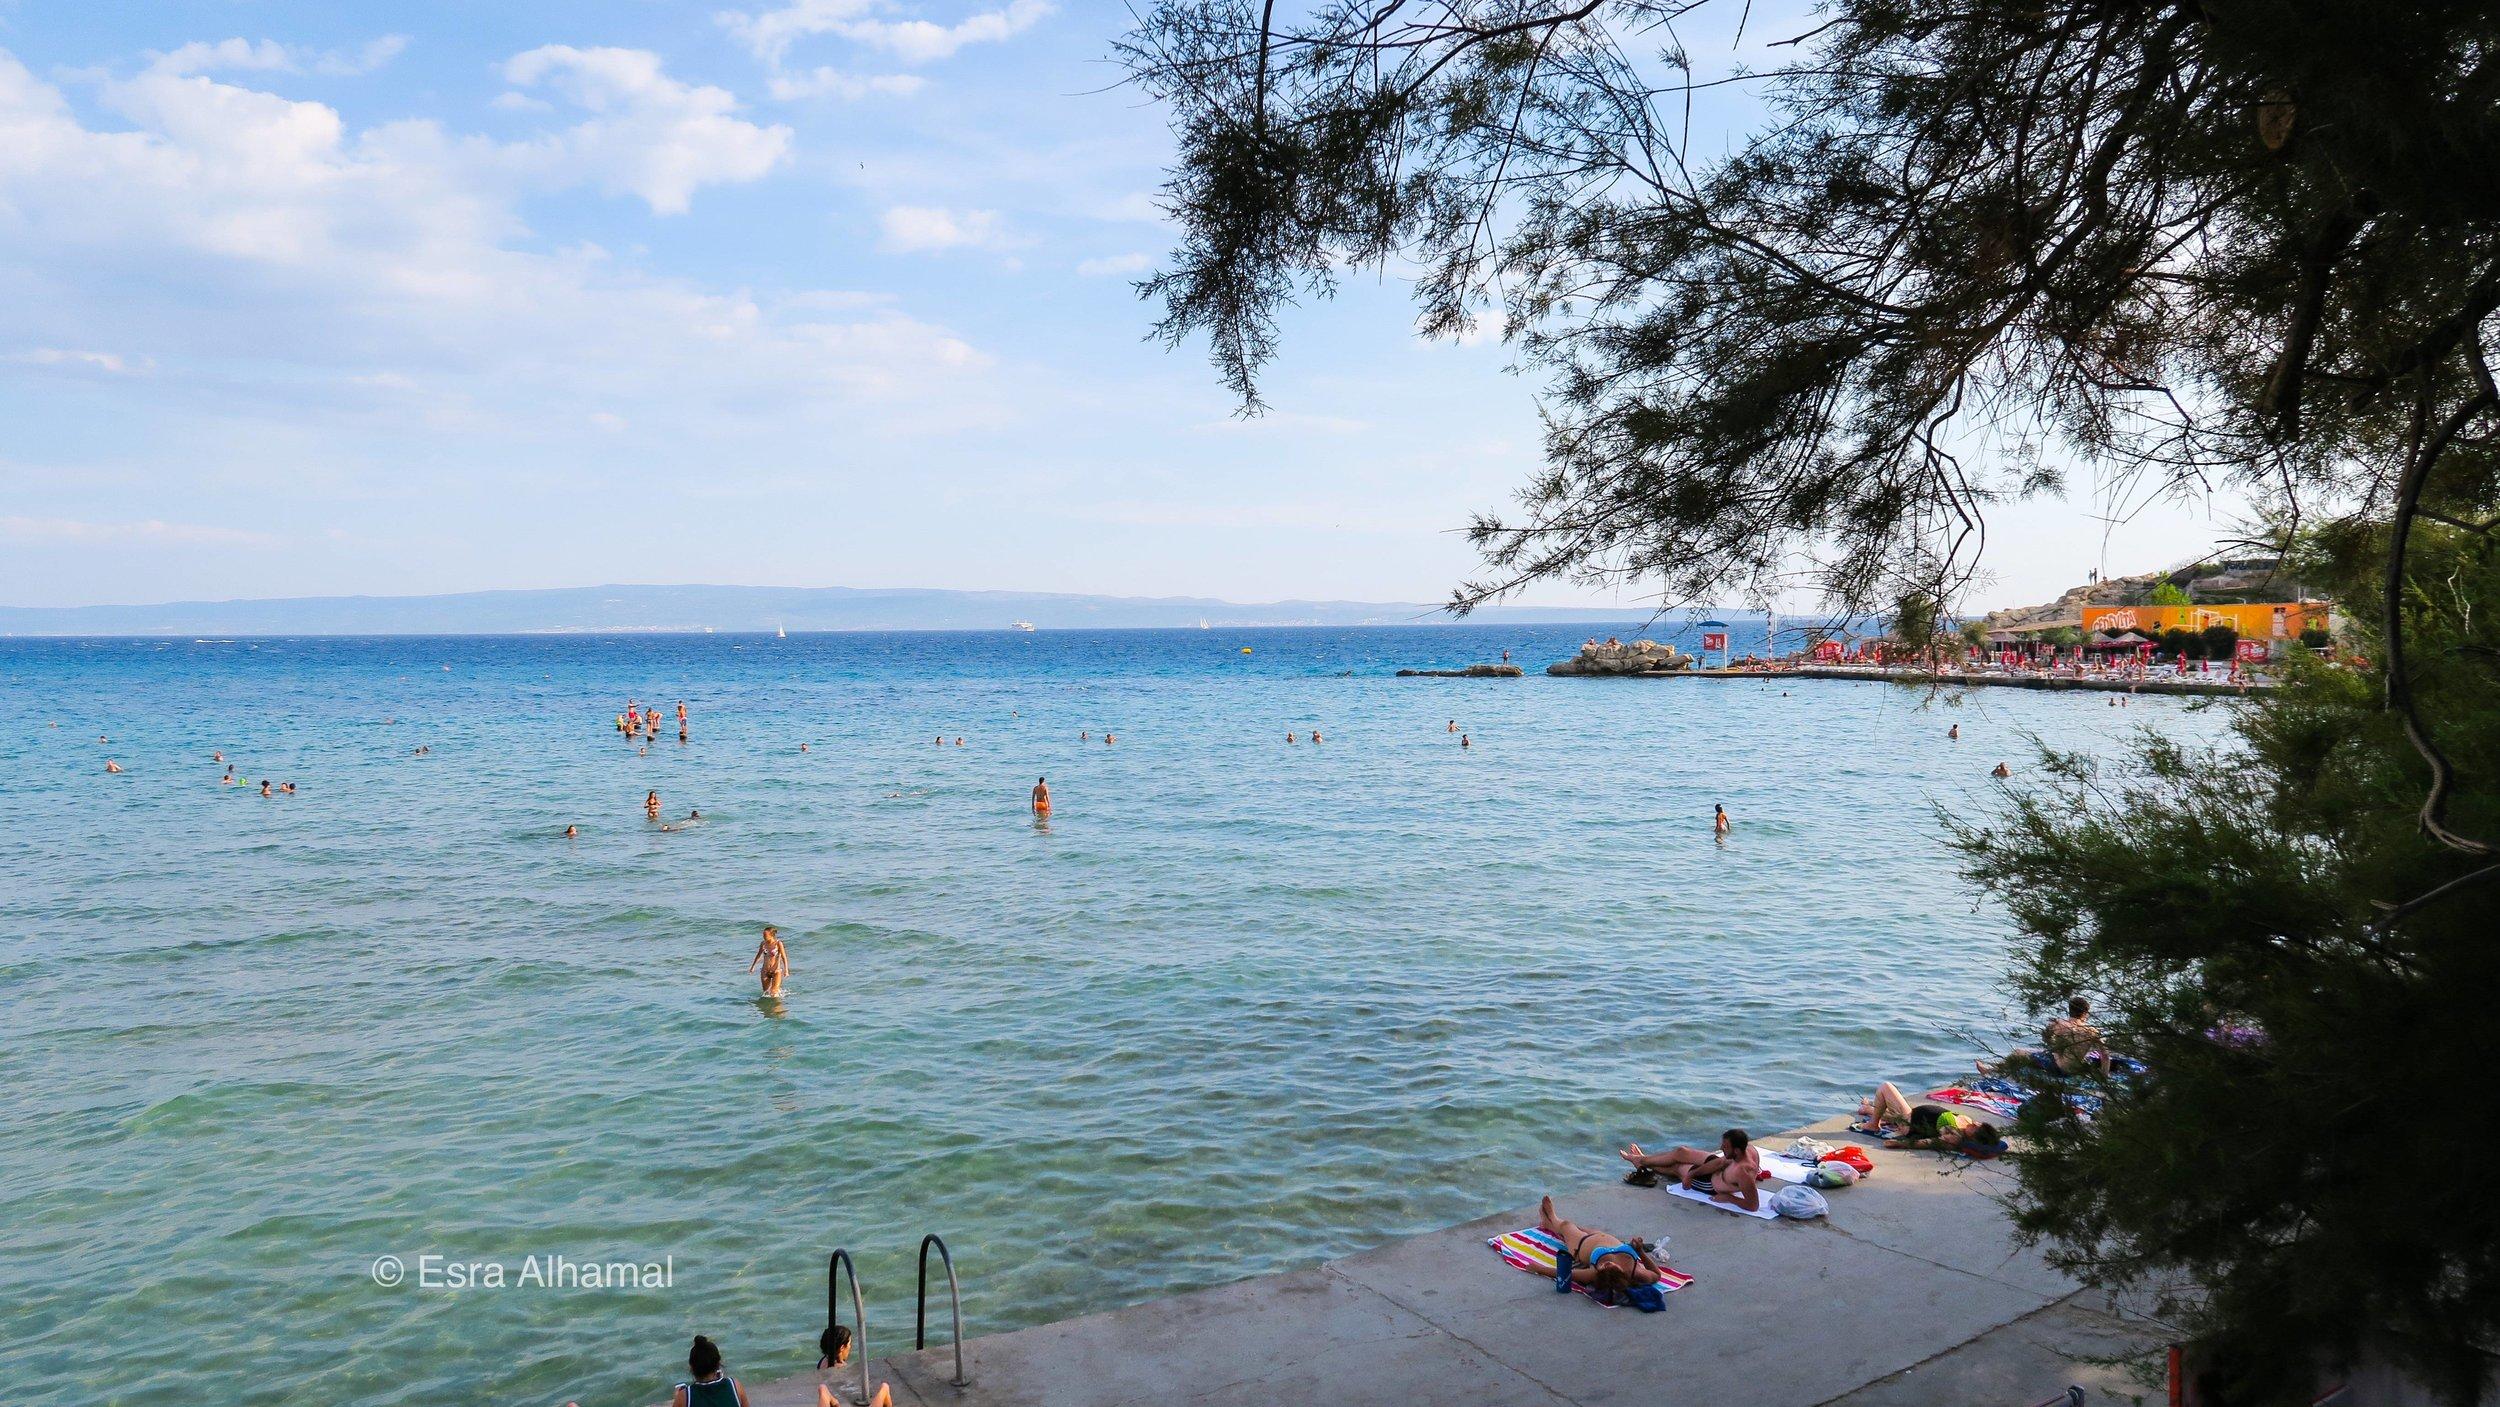 The beach in Split